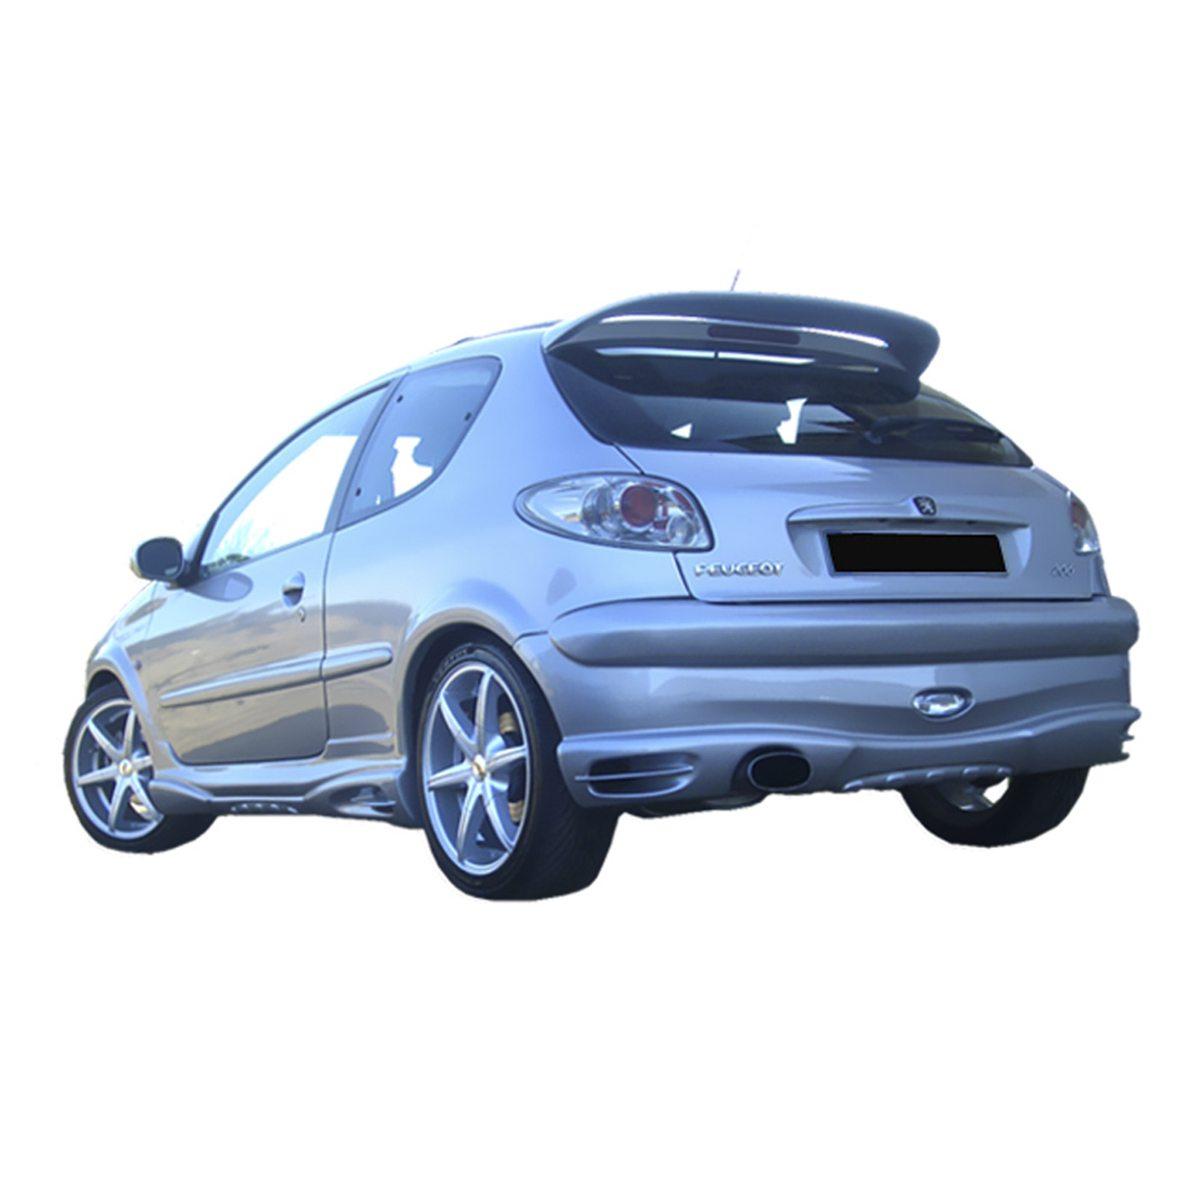 Peugeot-206-Super-GT-Tras-PCU0612